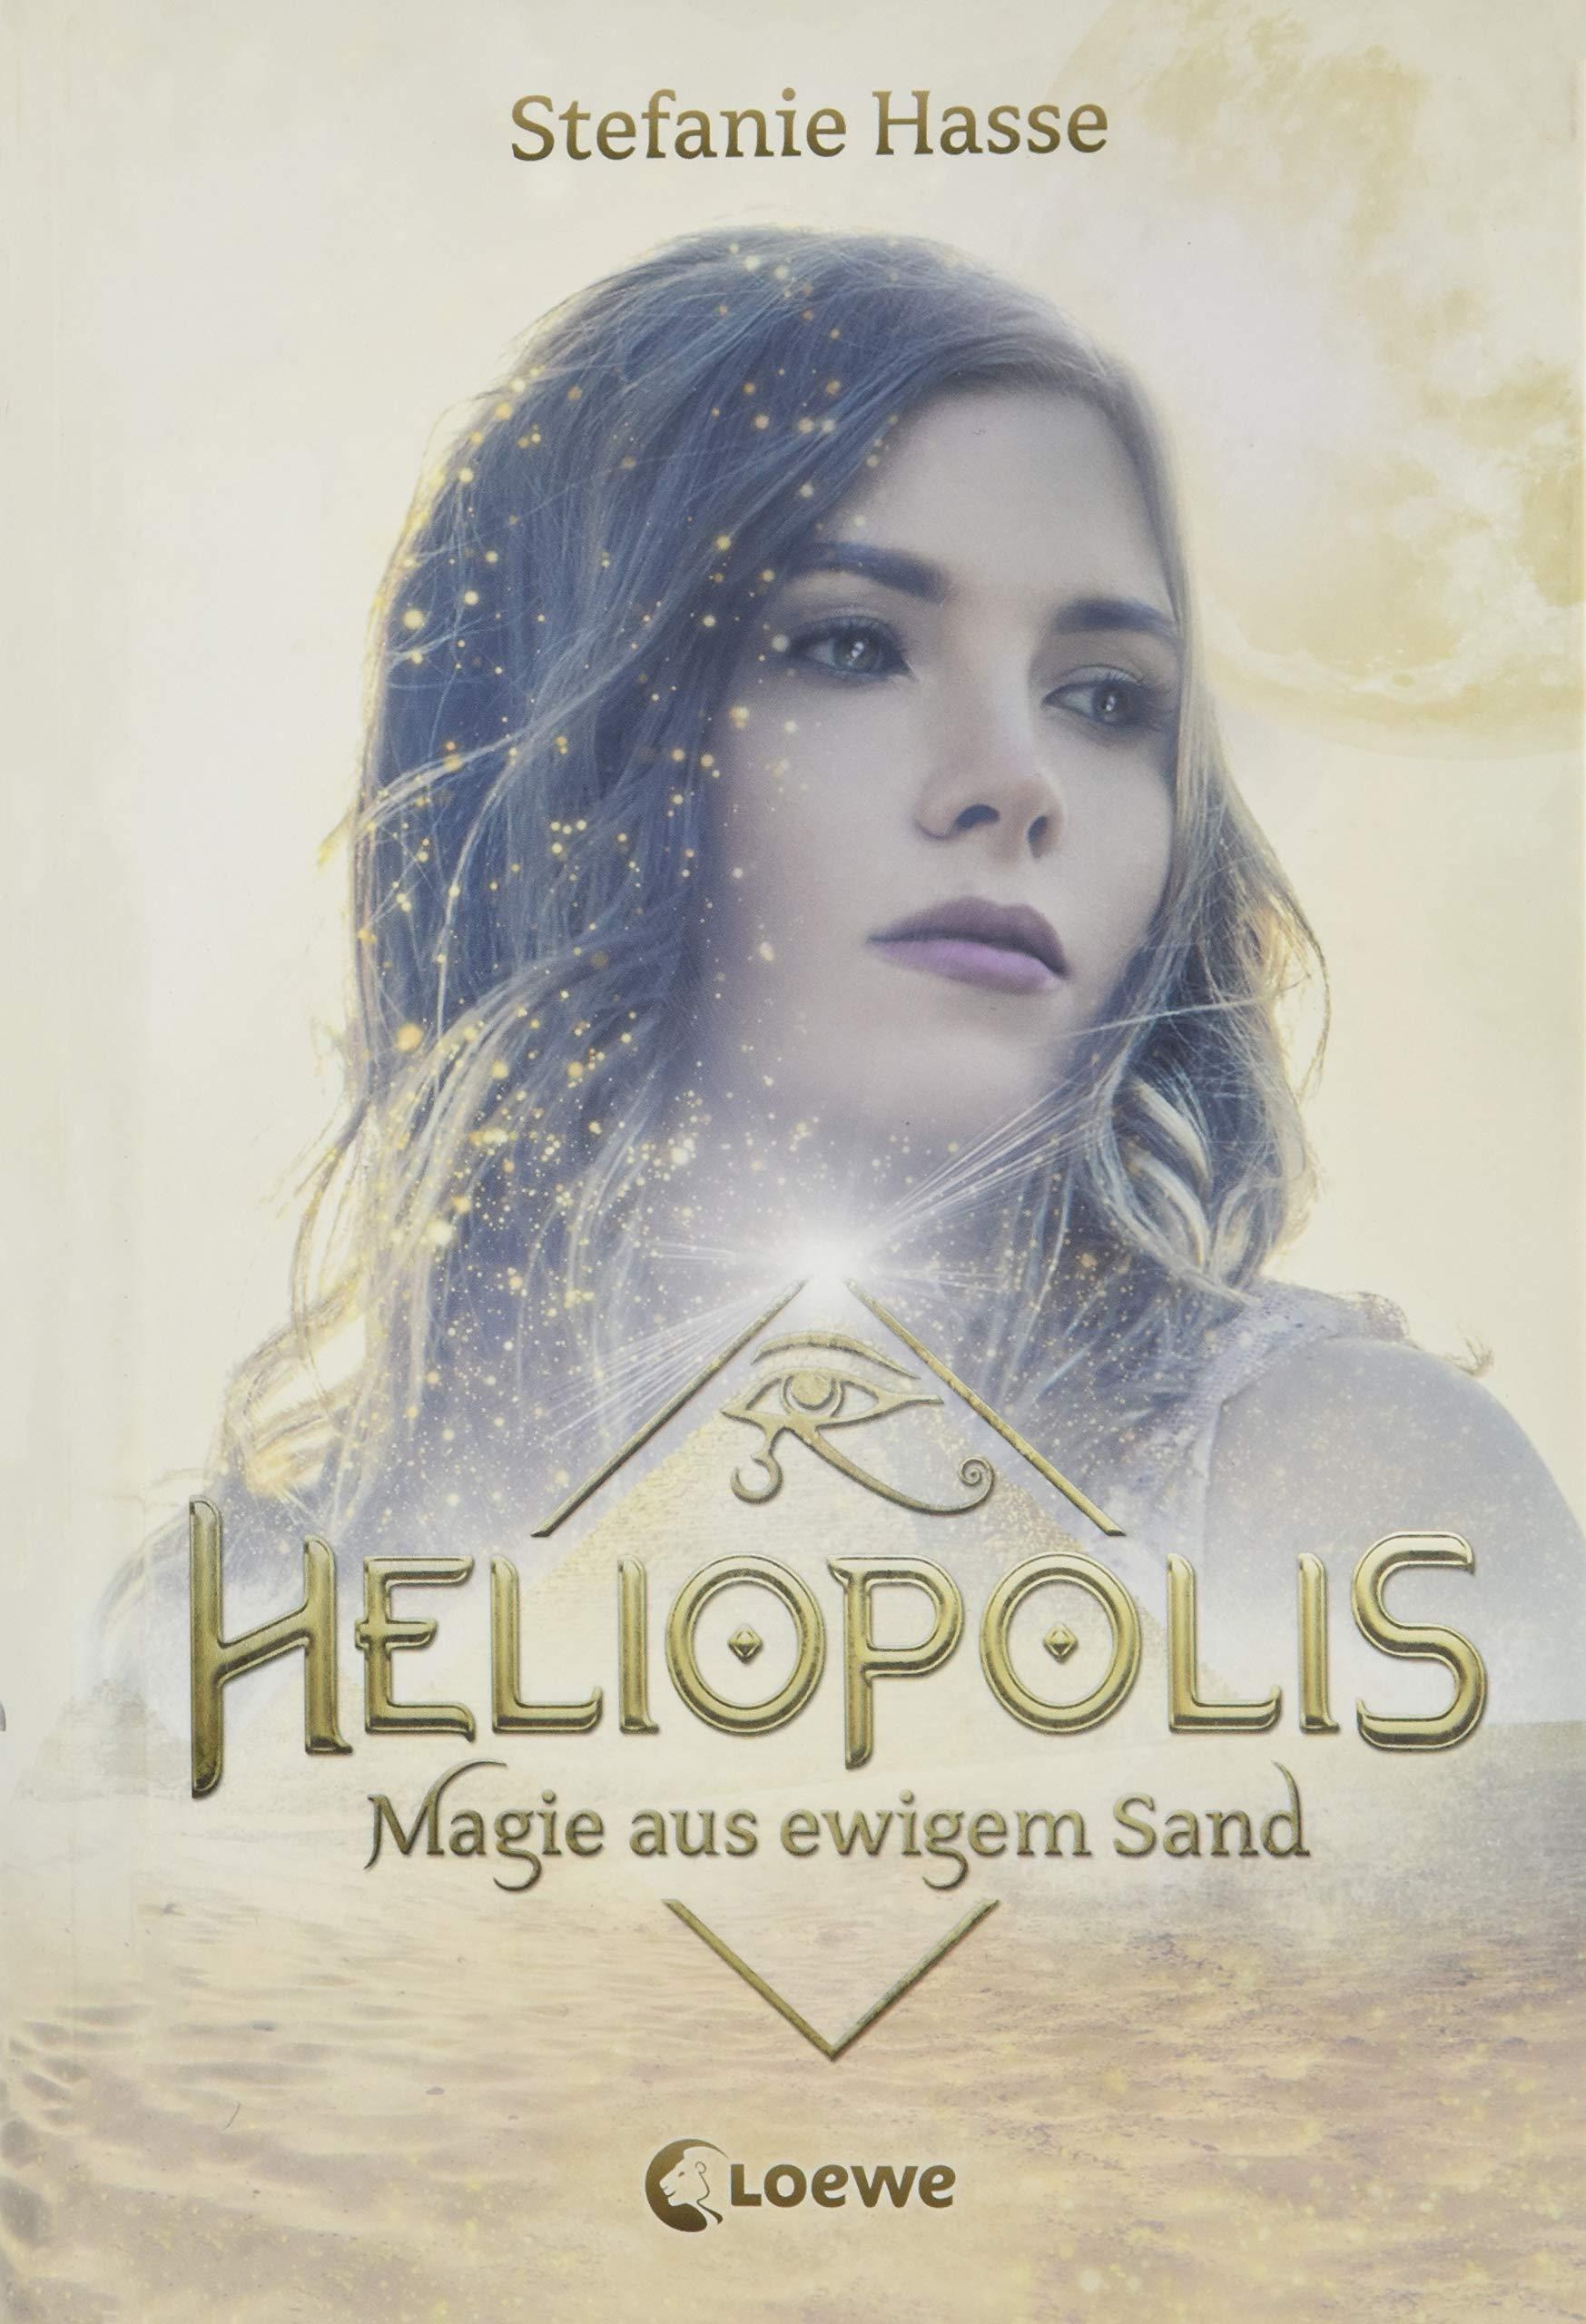 Heliopolis-Magie-aus-ewigem-Sand_Stefanie-Hasse.jpg